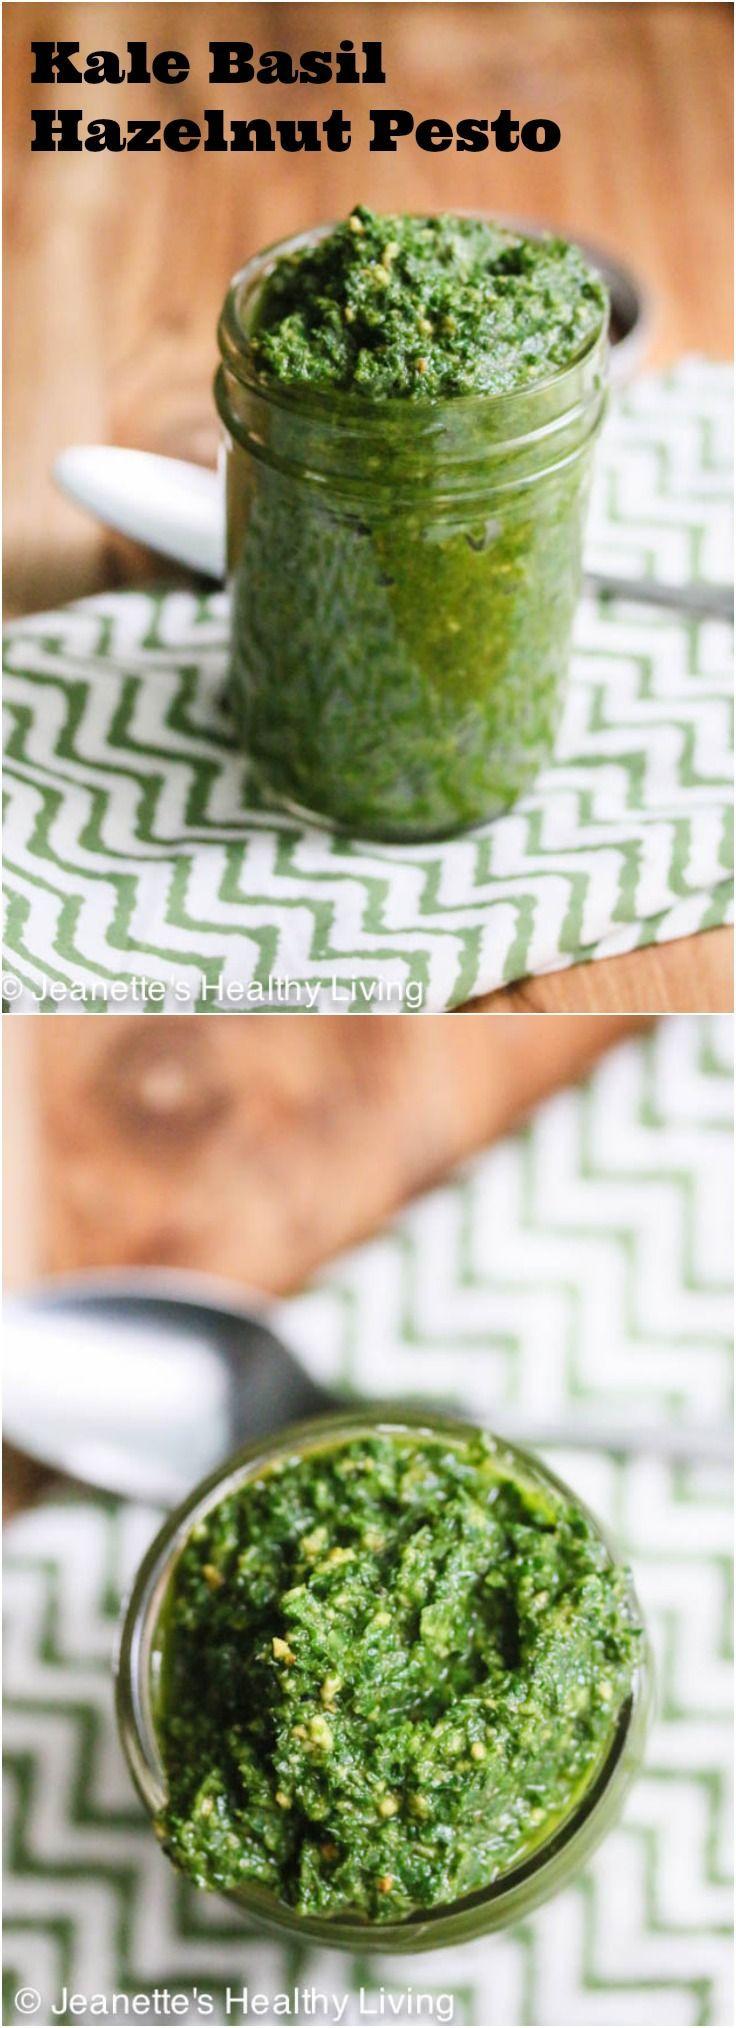 Is Pesto Sauce Healthy  Kale Basil Hazelnut Pesto Recipe